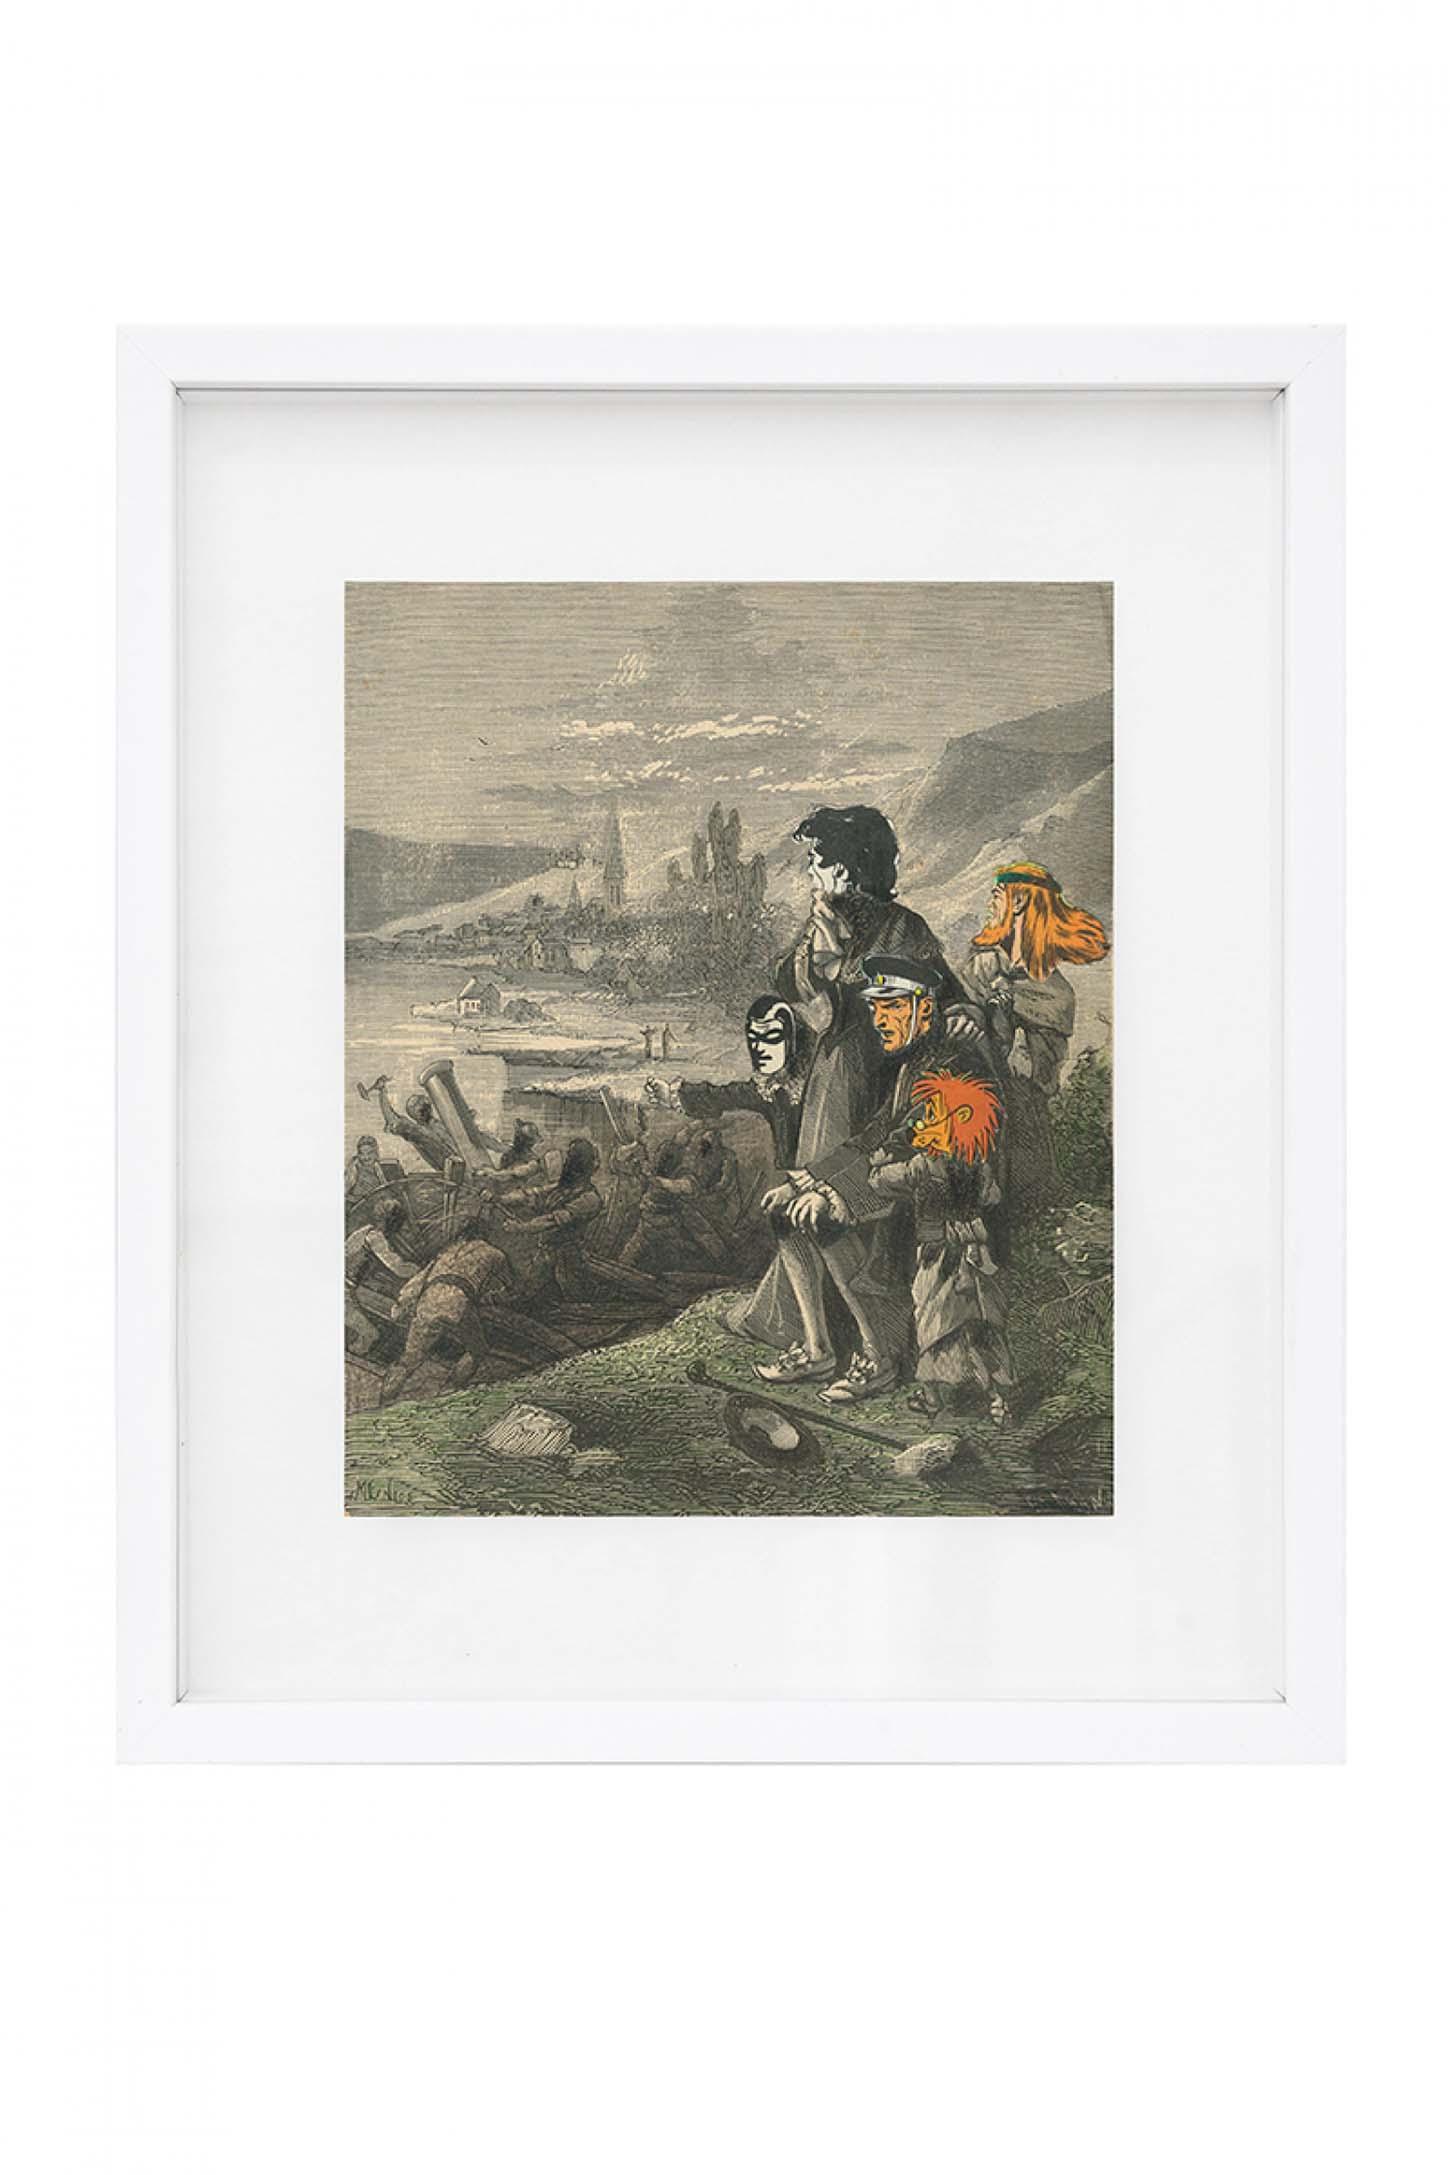 La galerie: La IIIe narine Hippolyte Hentgen Sans titre, 2015 Collage, 22,5 x 18 cm Courtesy : Gal. Semiose